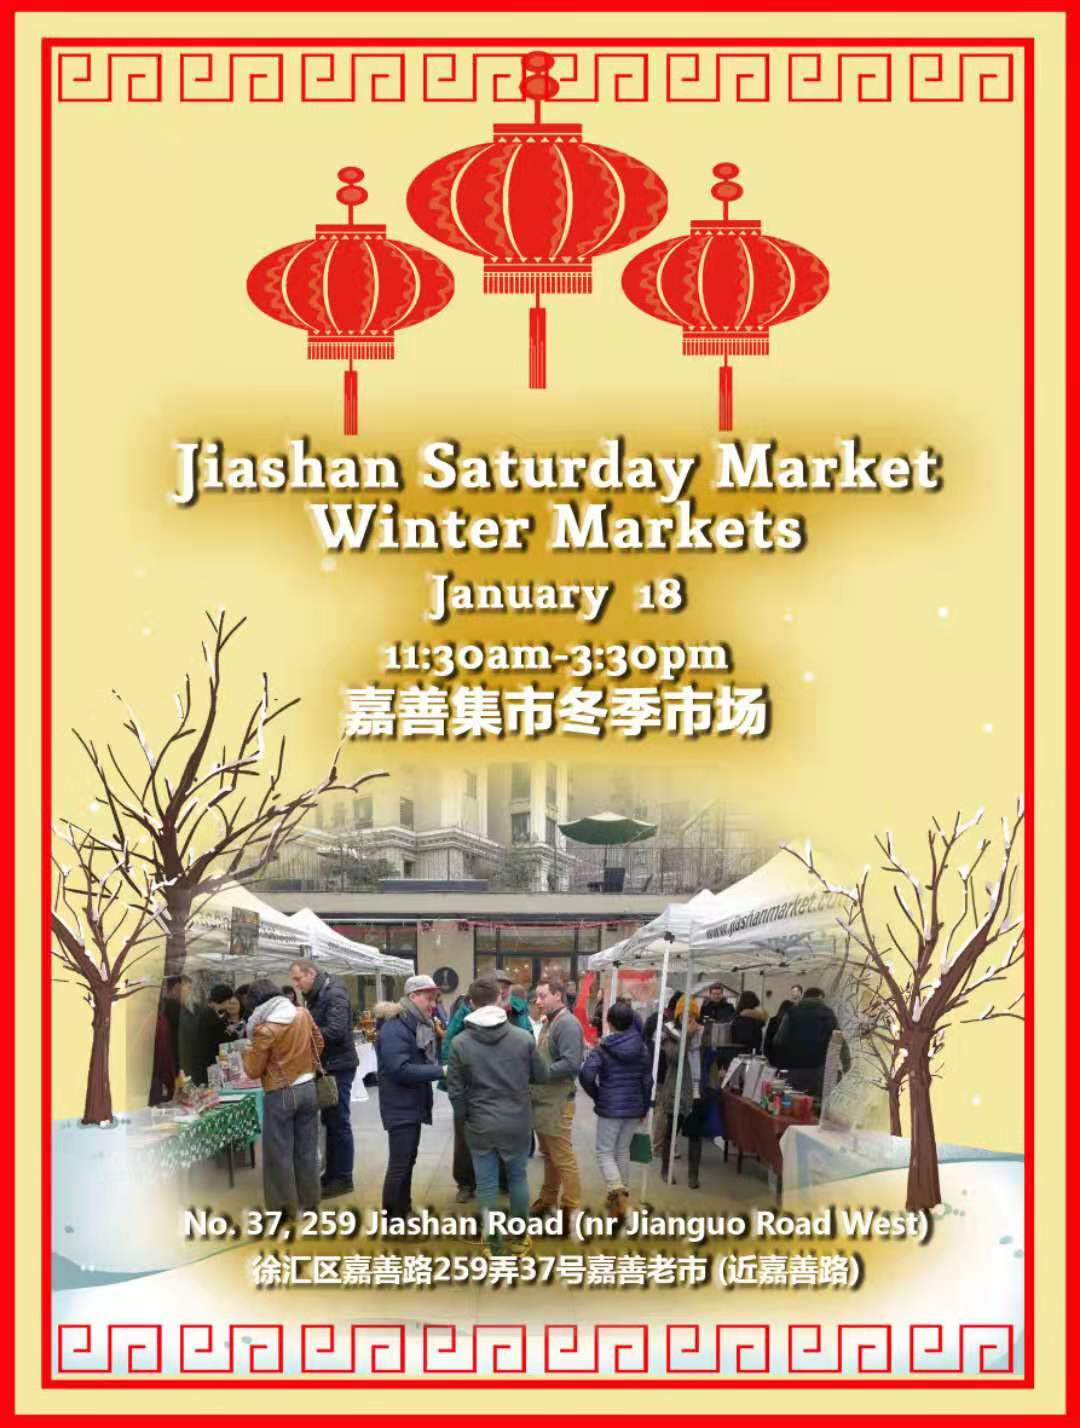 Jiashan Saturday Market